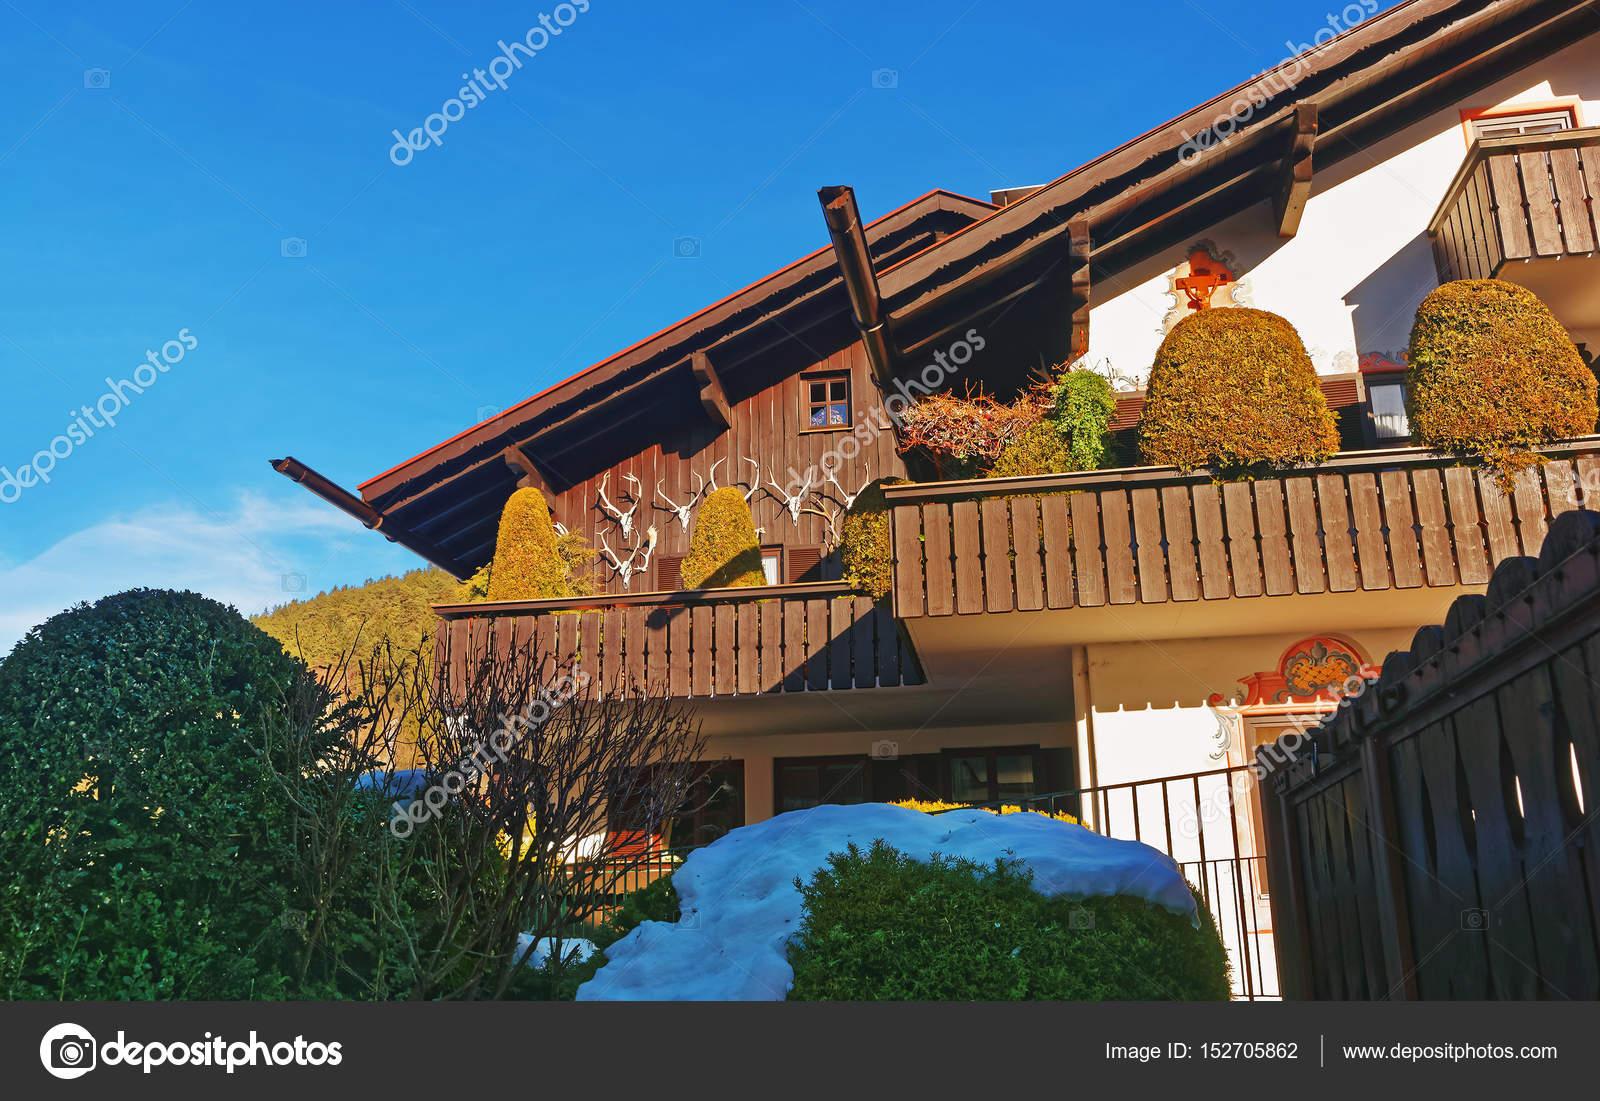 Een Winters Balkon : Балкон с рогами в зимний период Гармиш Партенкирхен u2014 Стоковое фото